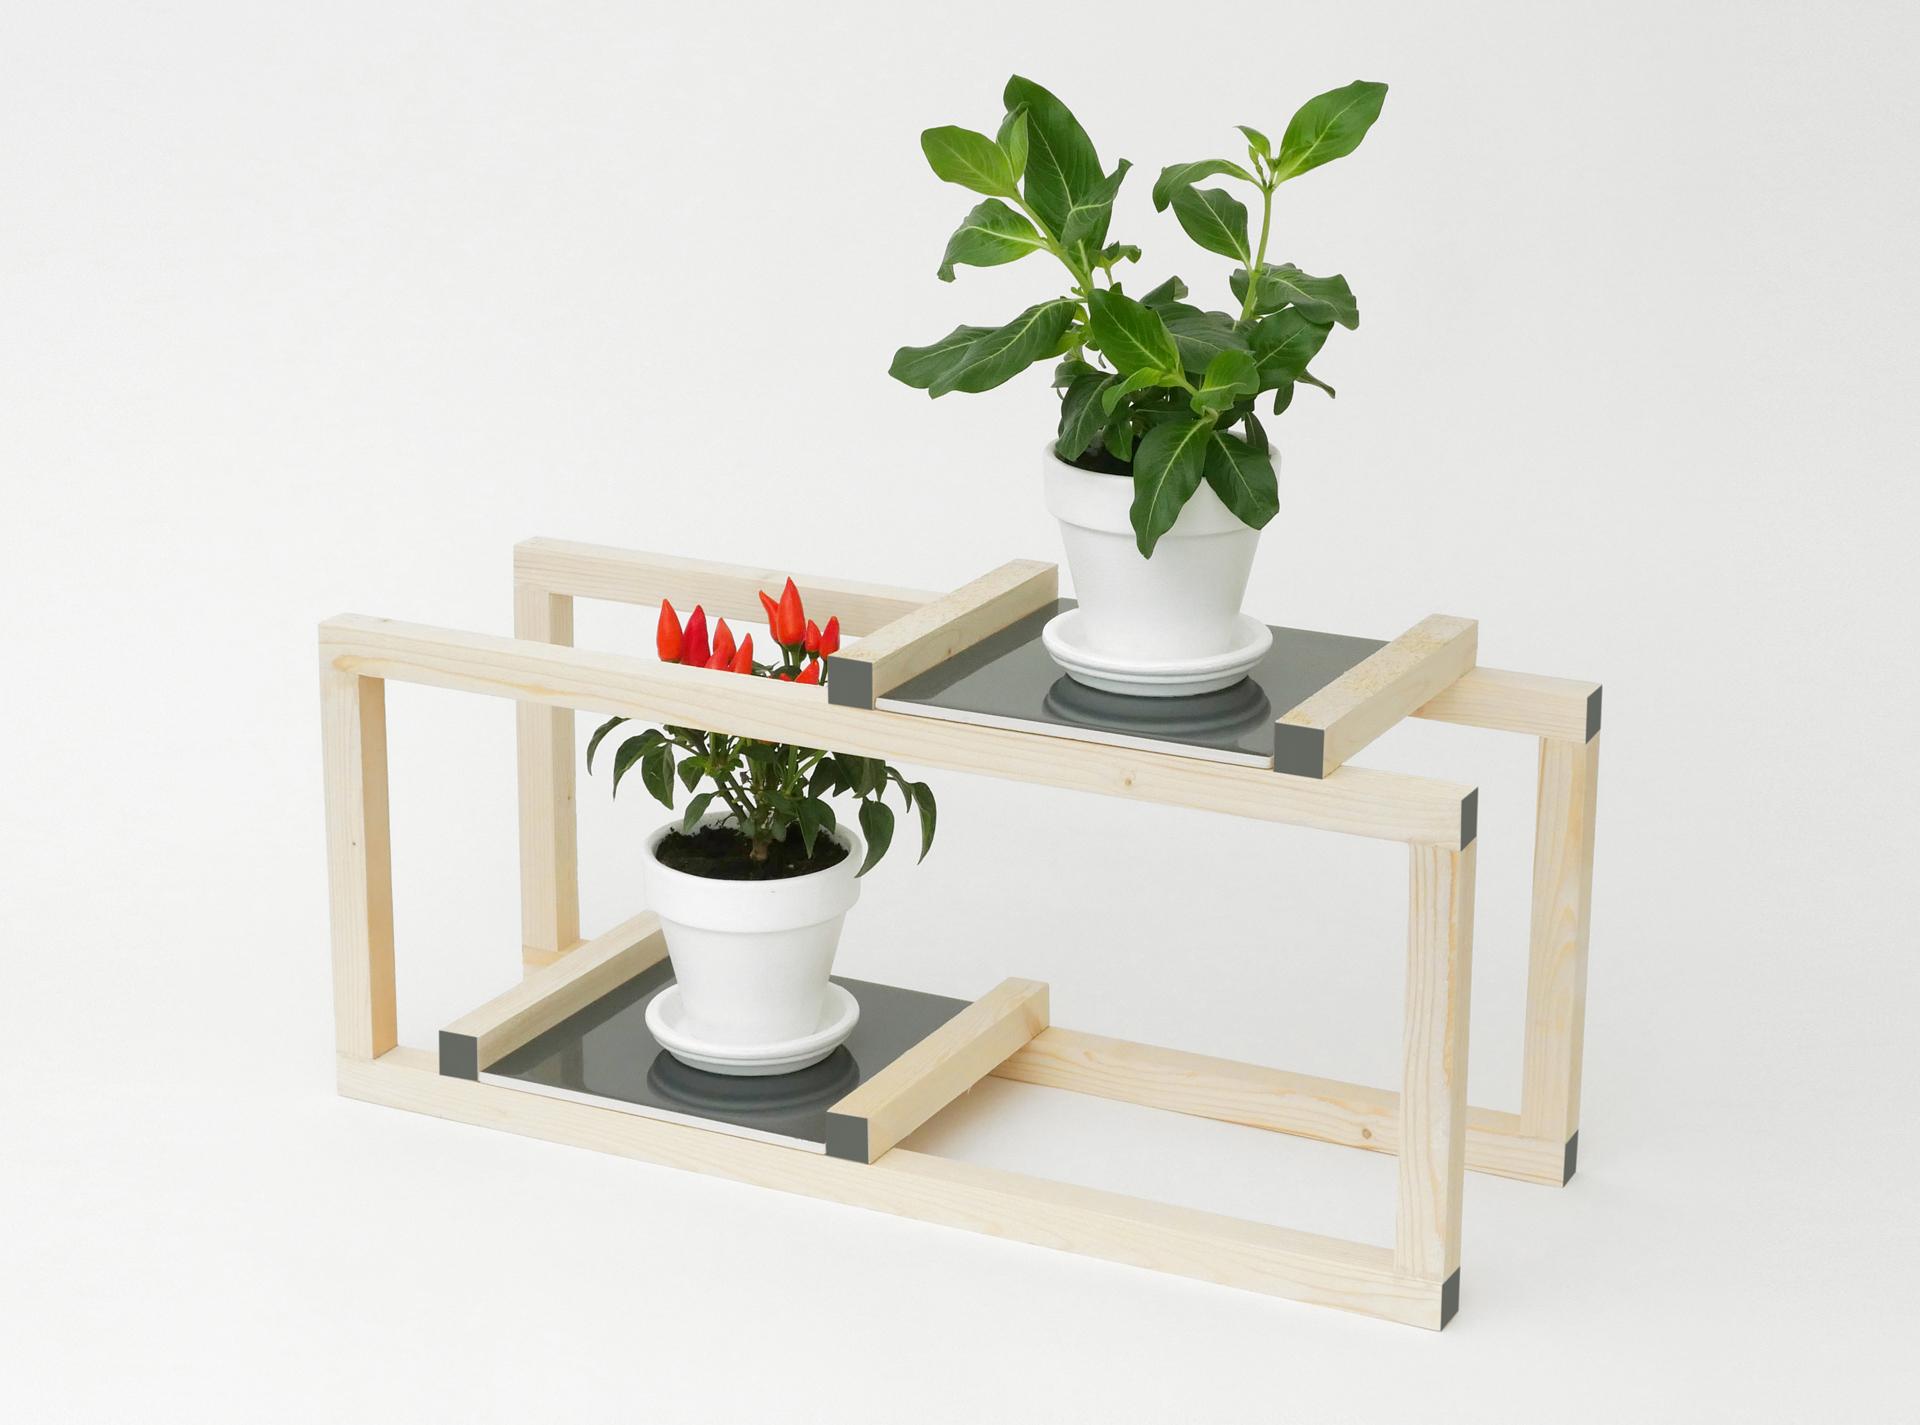 pierrelota_meuble_plantes_1_image13